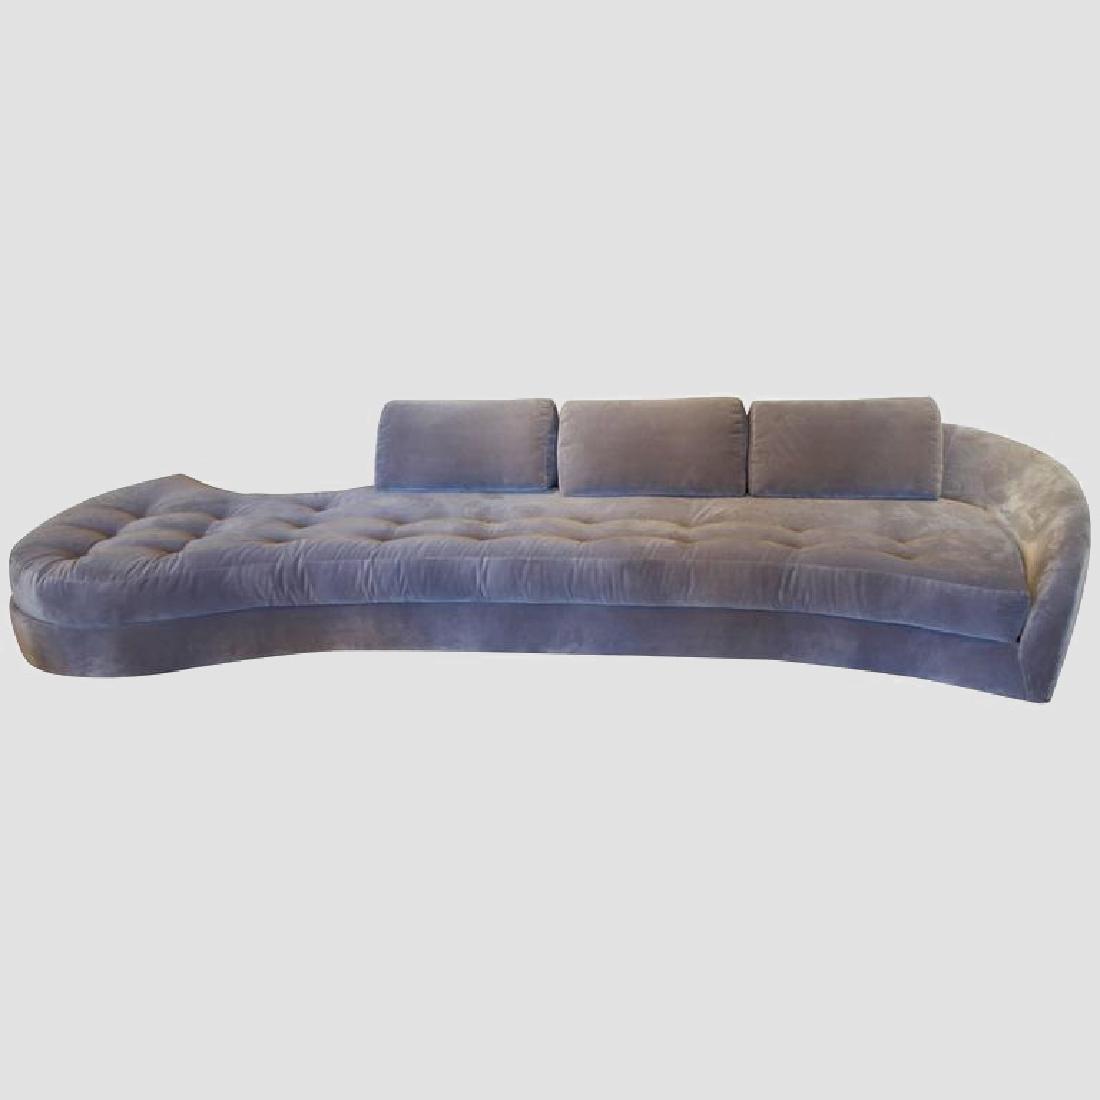 1950's Long Serpentine Sofa